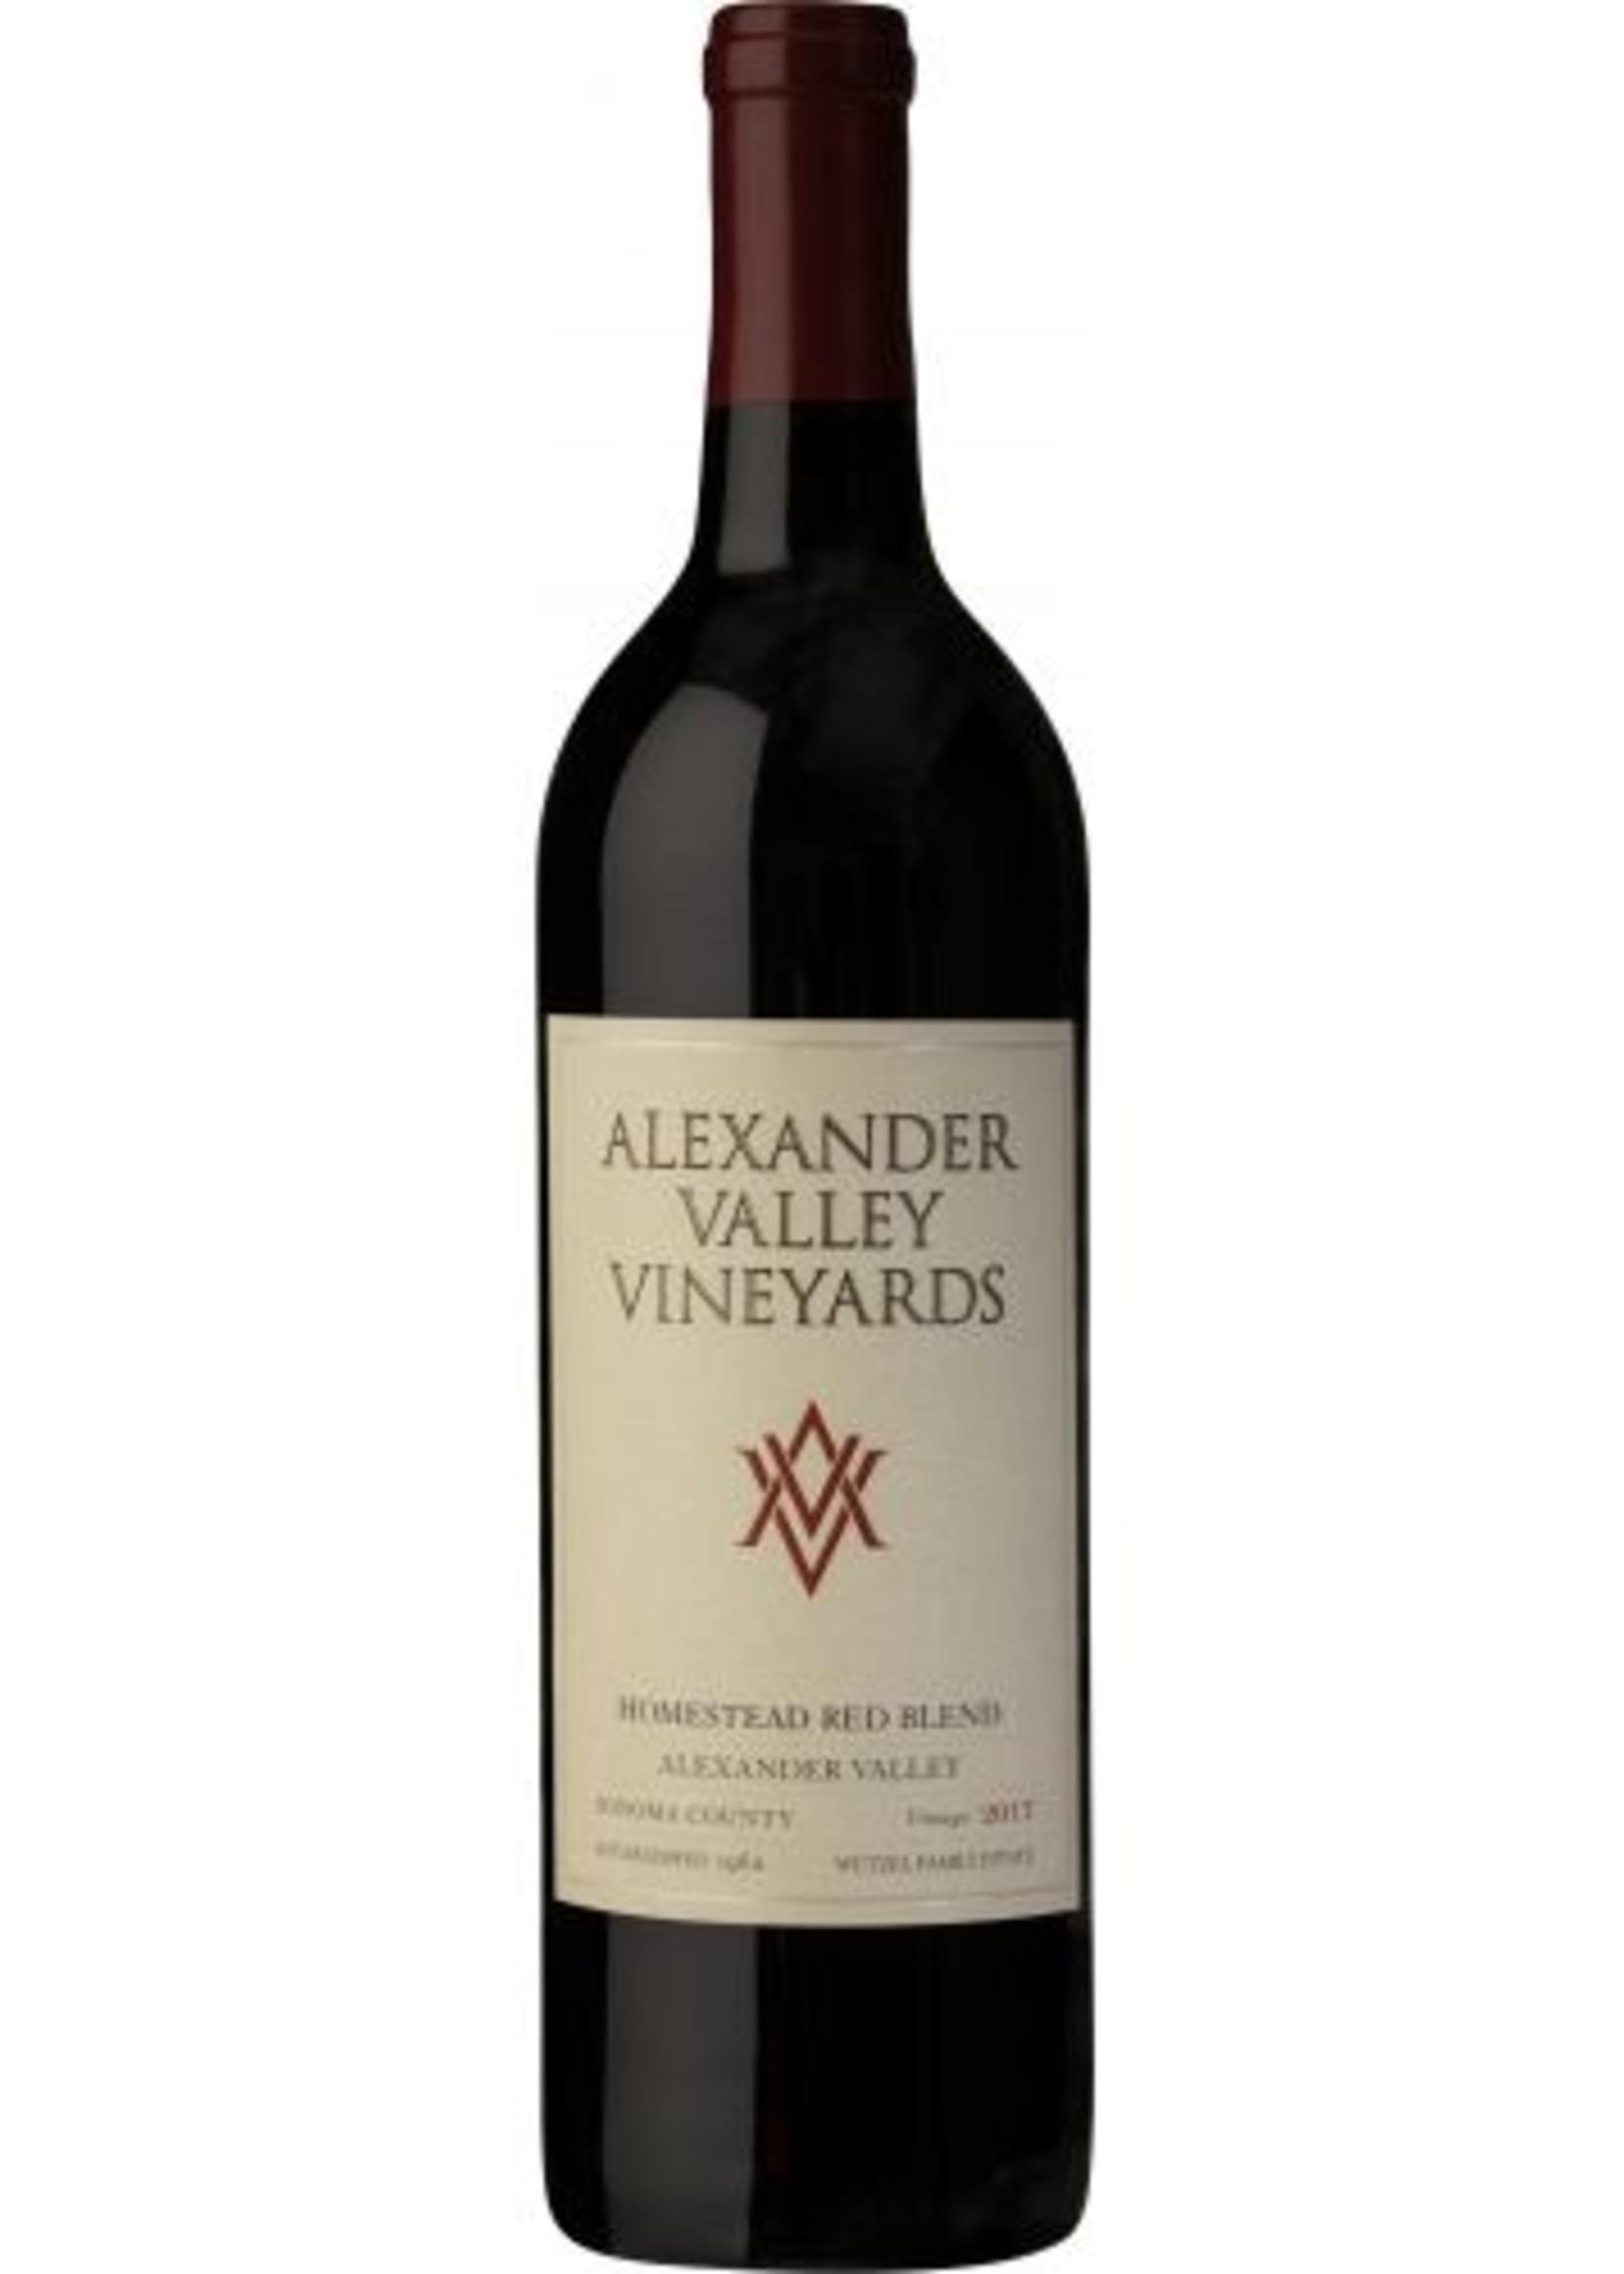 Alexander Homestead Red Blend